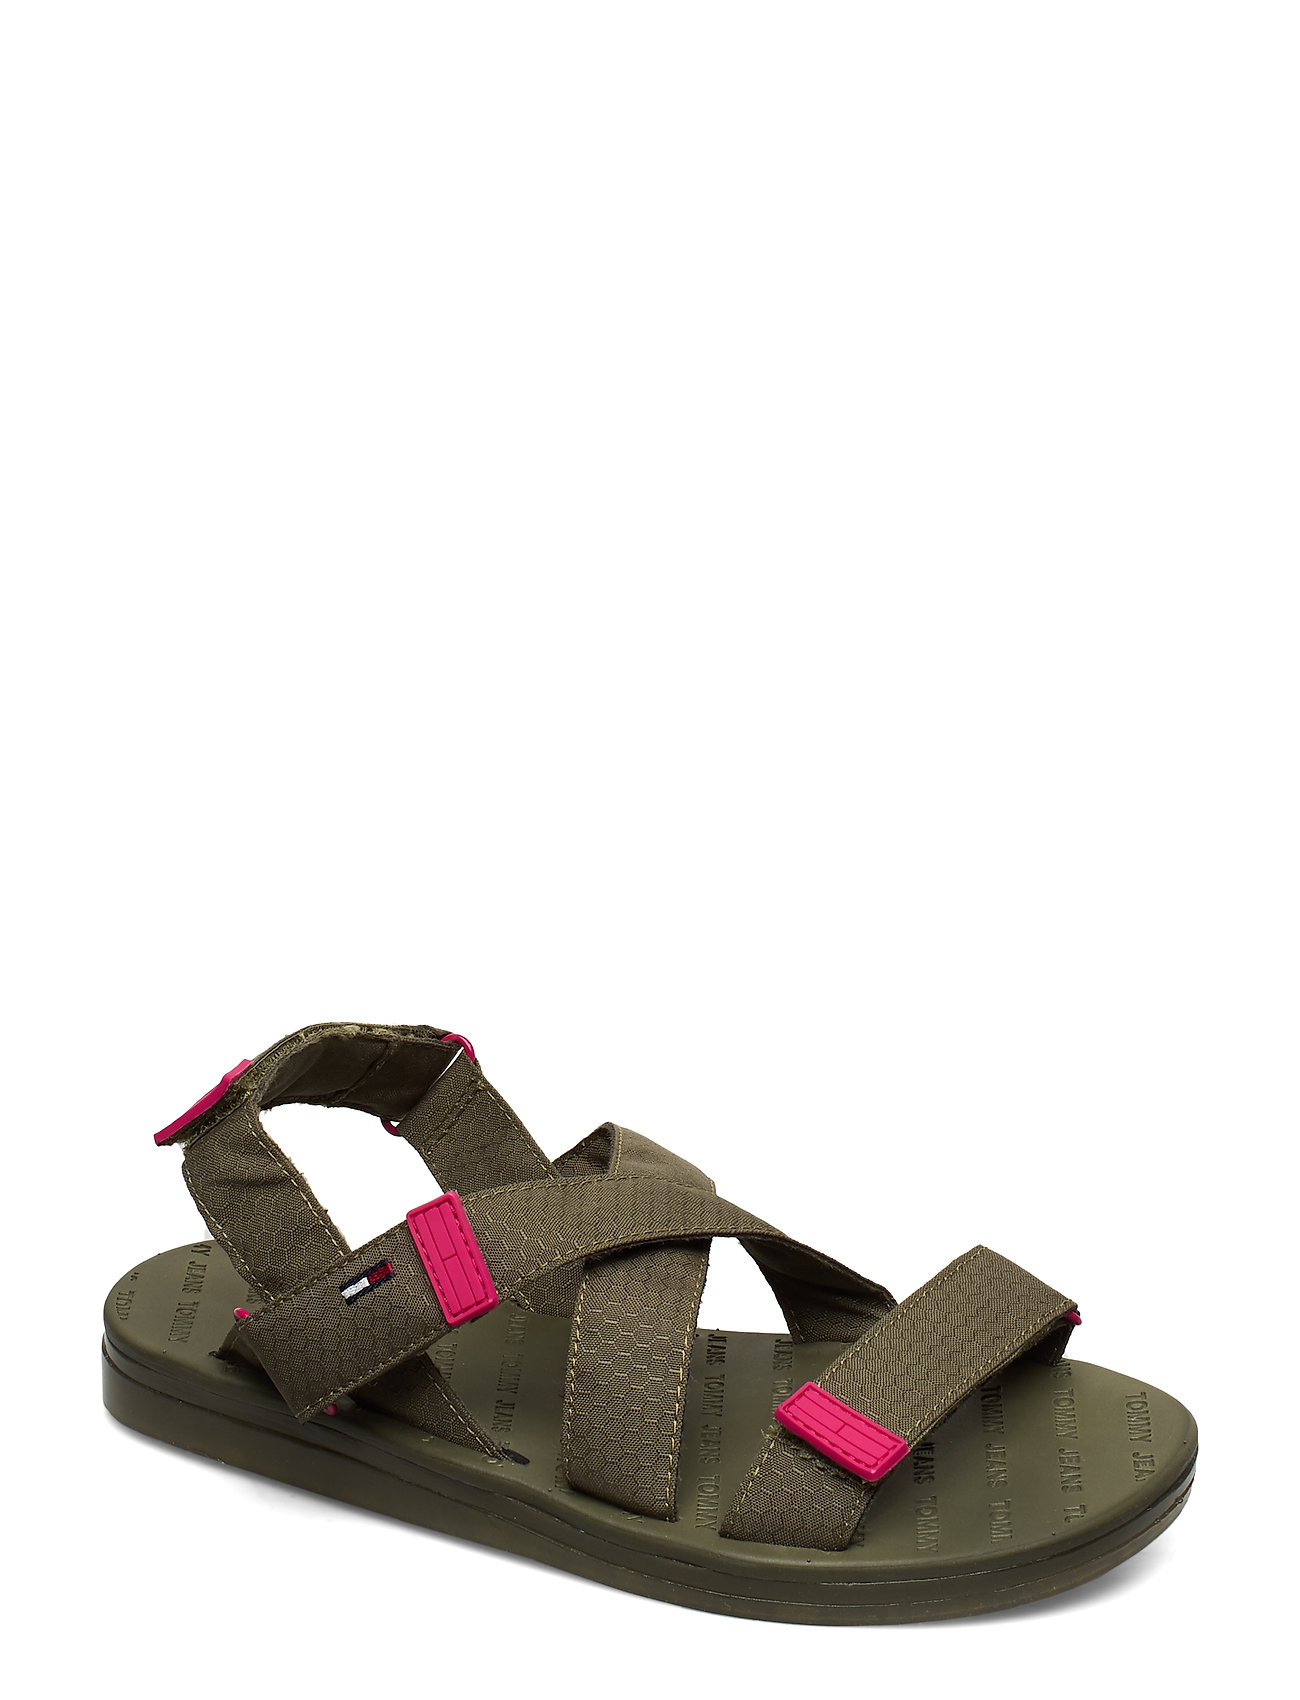 Image of Tommy Surplus Flat Sandal Shoes Summer Shoes Flat Sandals Grøn Tommy Hilfiger (3356555367)